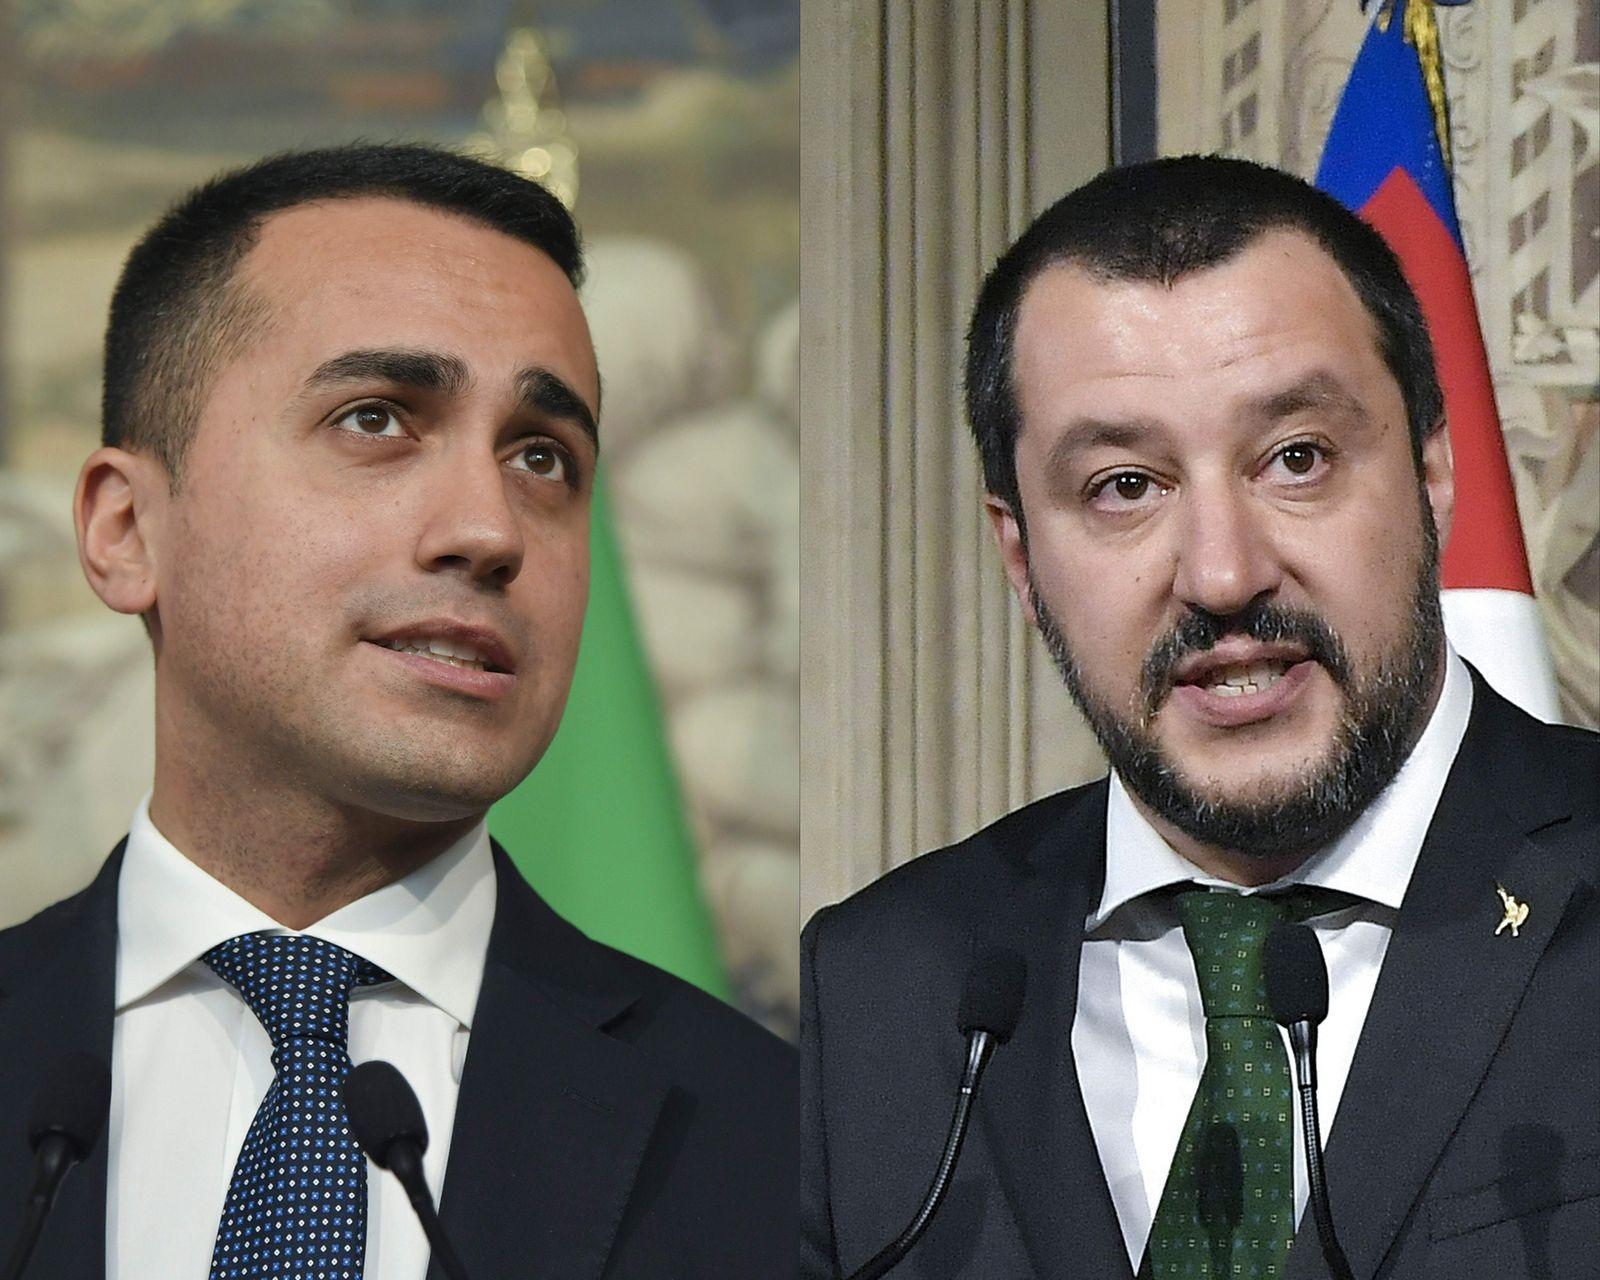 FILES-COMBO-ITALY-POLITICS-GOVERNMENT